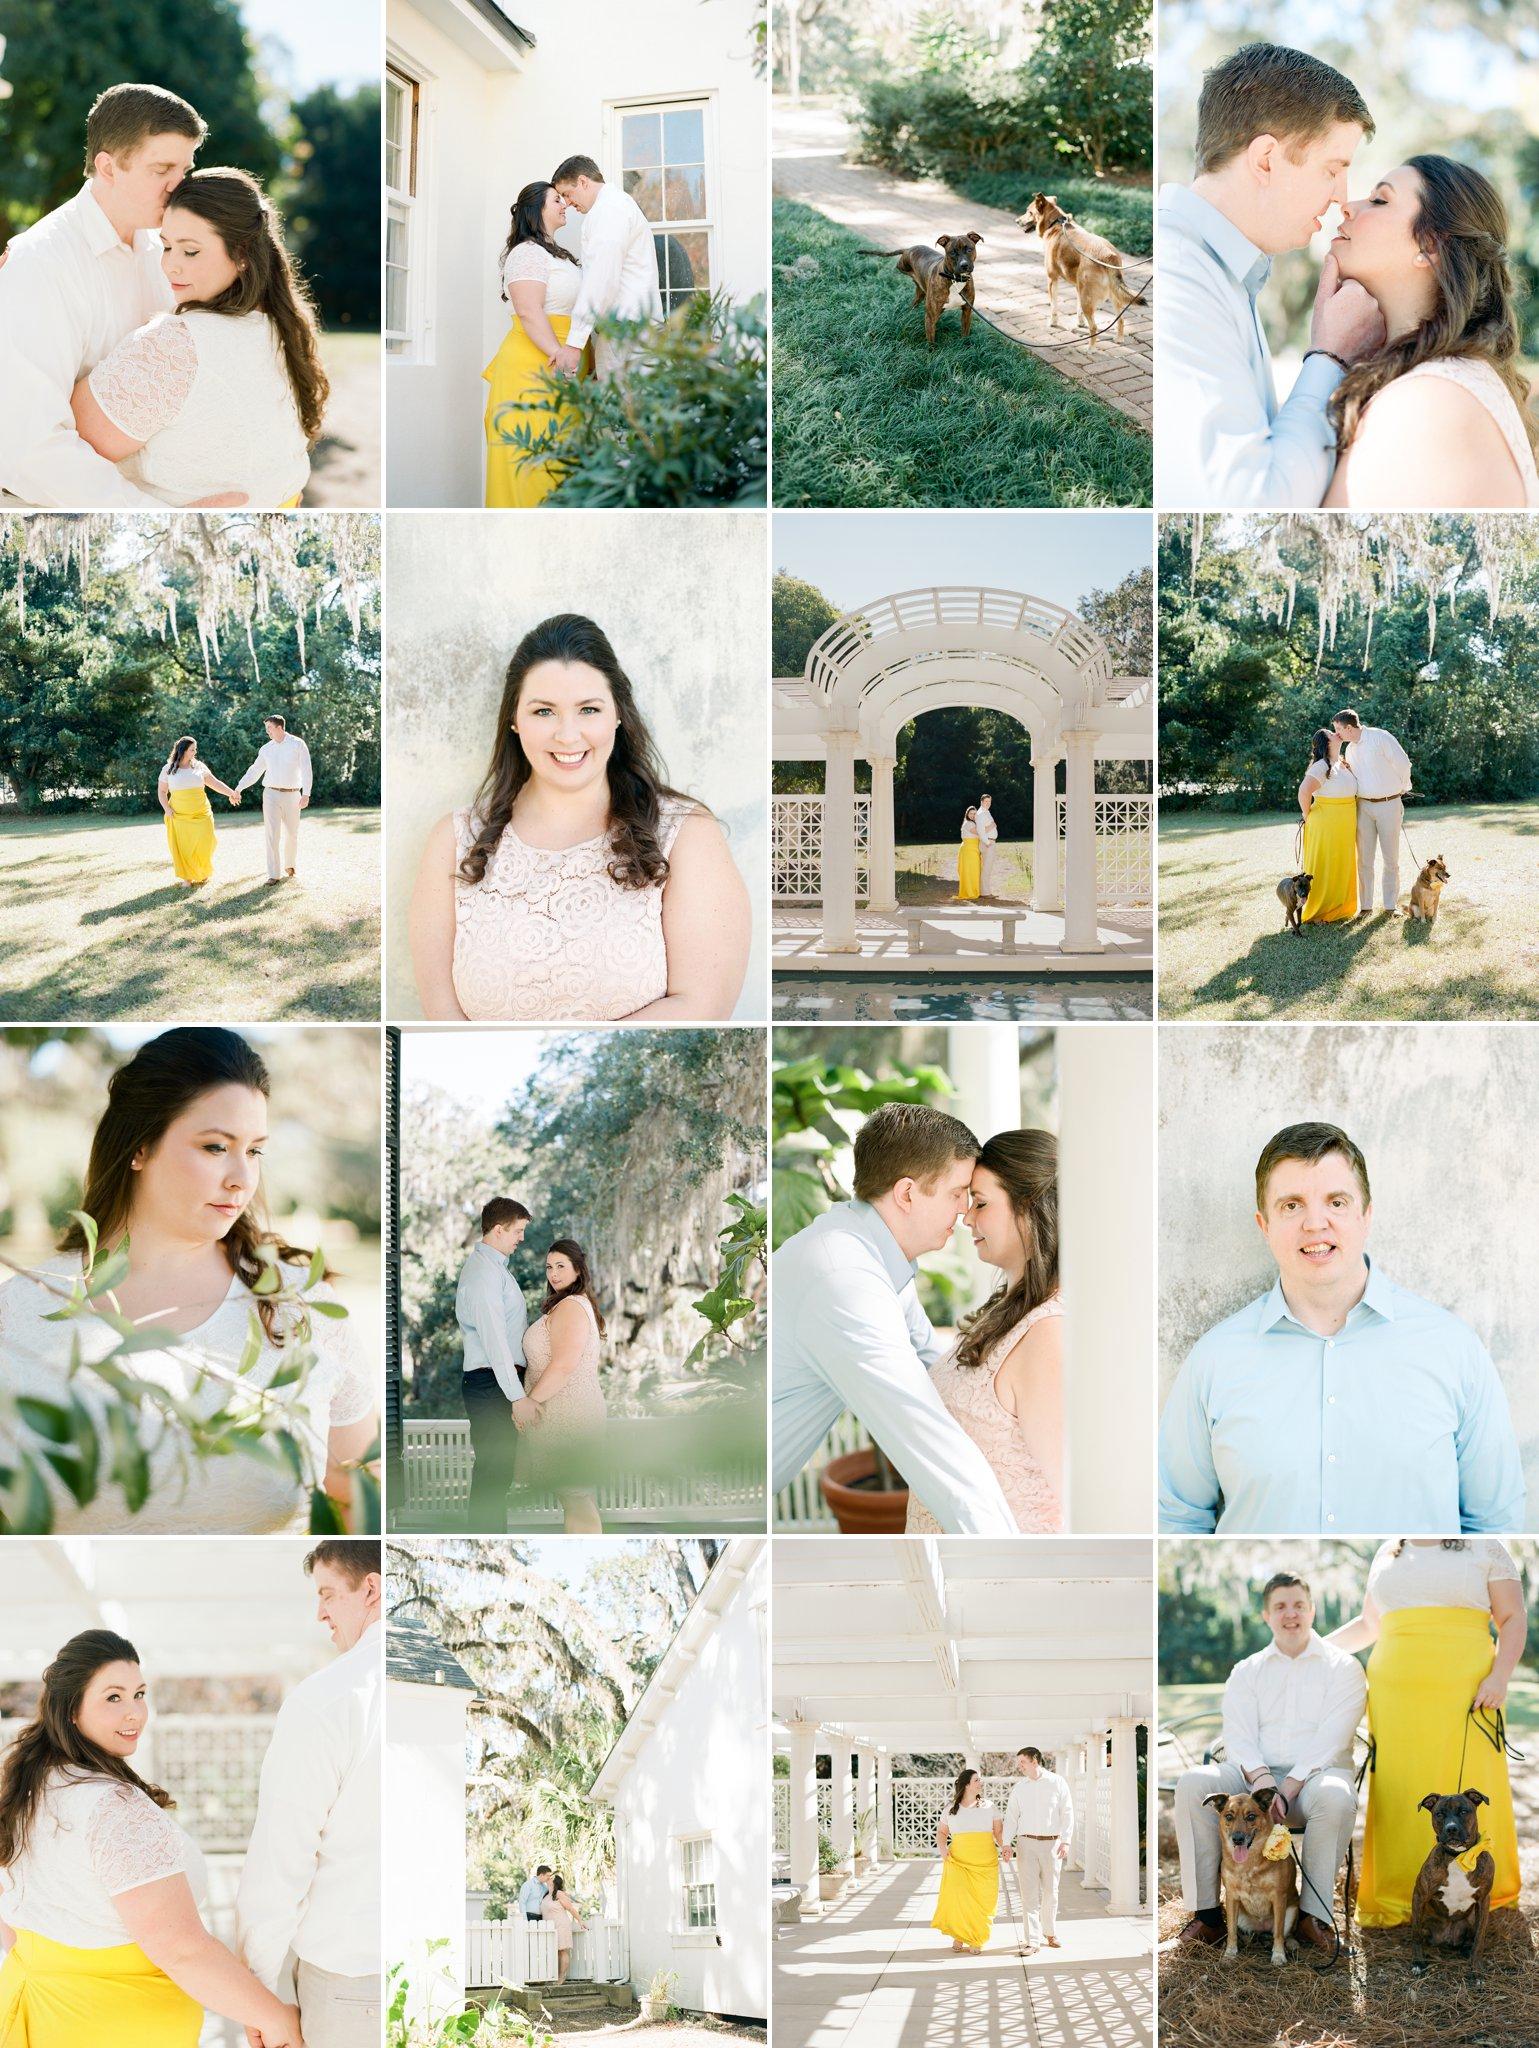 st augustine wedding photographer shannon griffin photography_0009.jpg